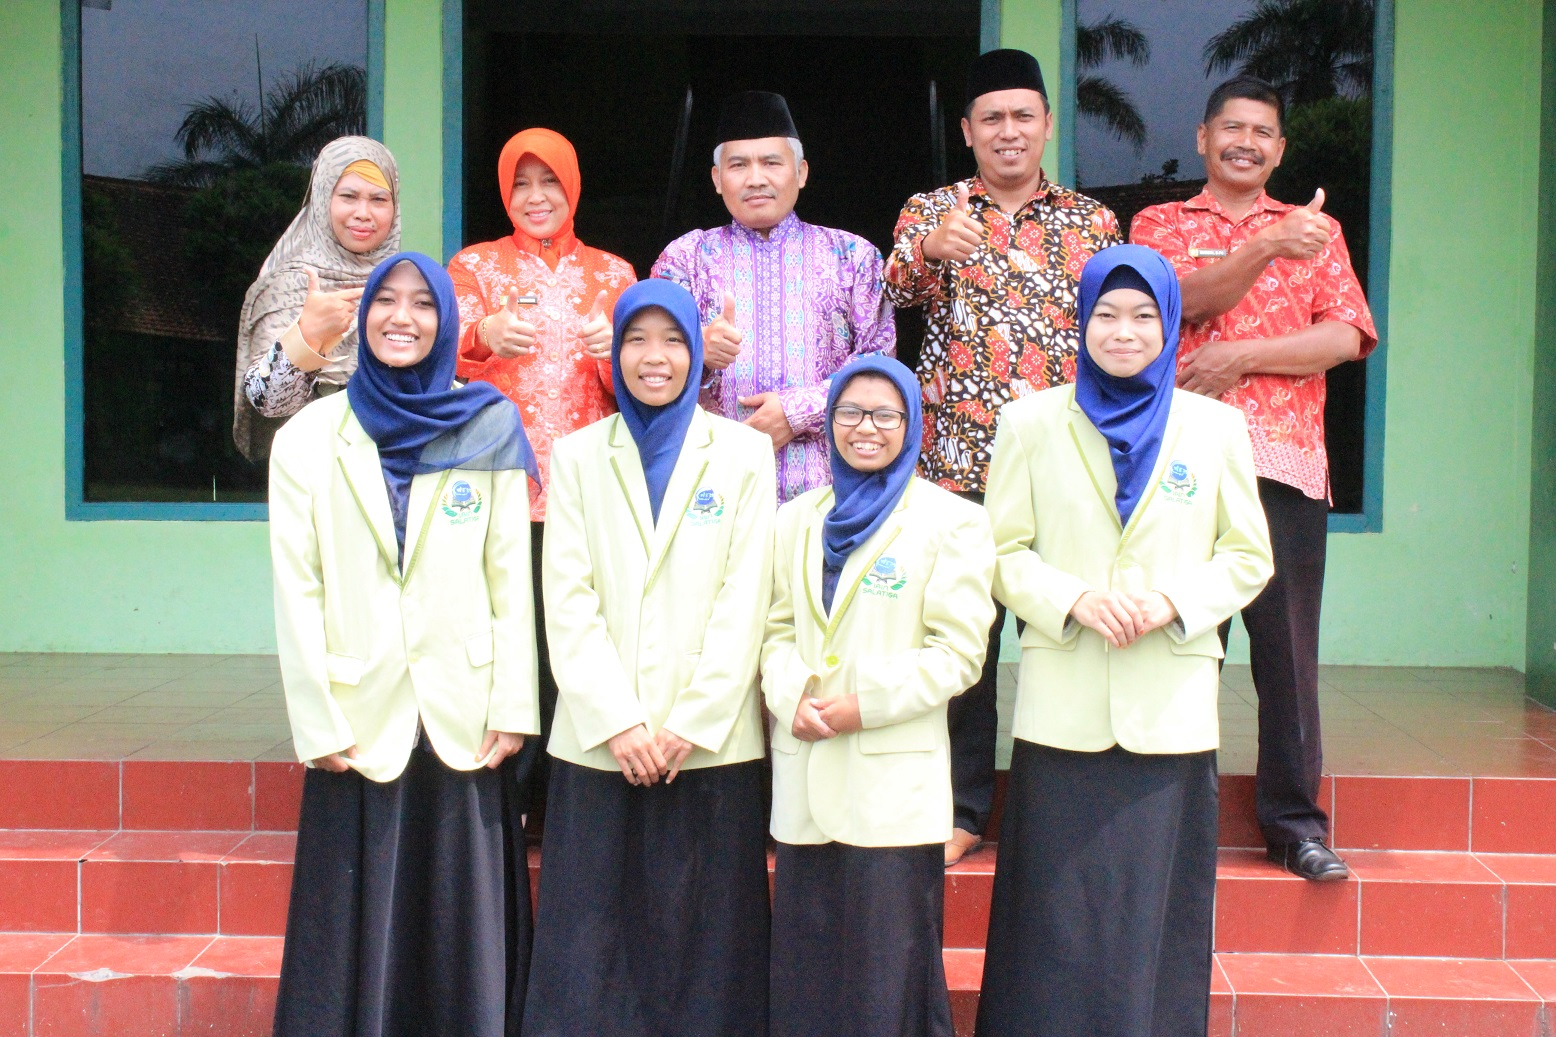 Foto Bersama dari kiri ke kanan: Dra. Astuti Sakdiyah, M.Pd., Dra. Winarni (Kepala Sekolah SMA Kartika III-1), Drs. Abdul Syukur, M.Si., Edi Kuswanto, S.Pd.I., Purwanto dan Tim Fiqh Wanita (berjas)